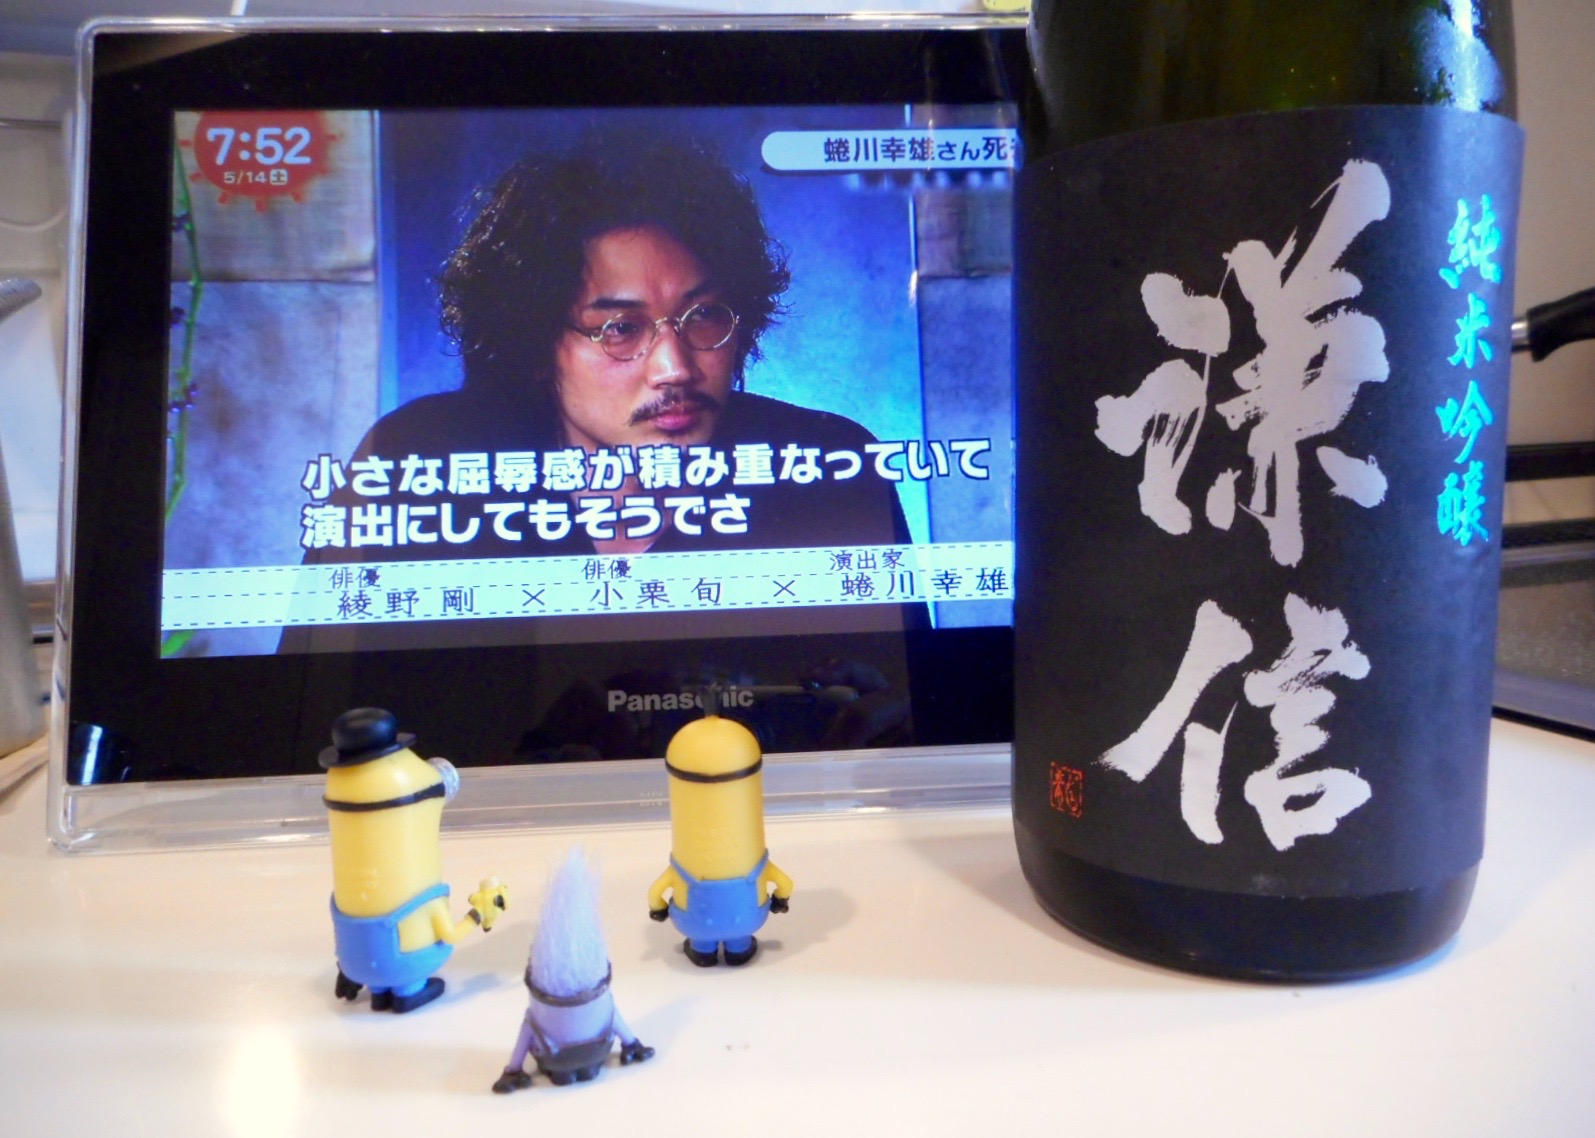 kenshin_aiyama1.jpg